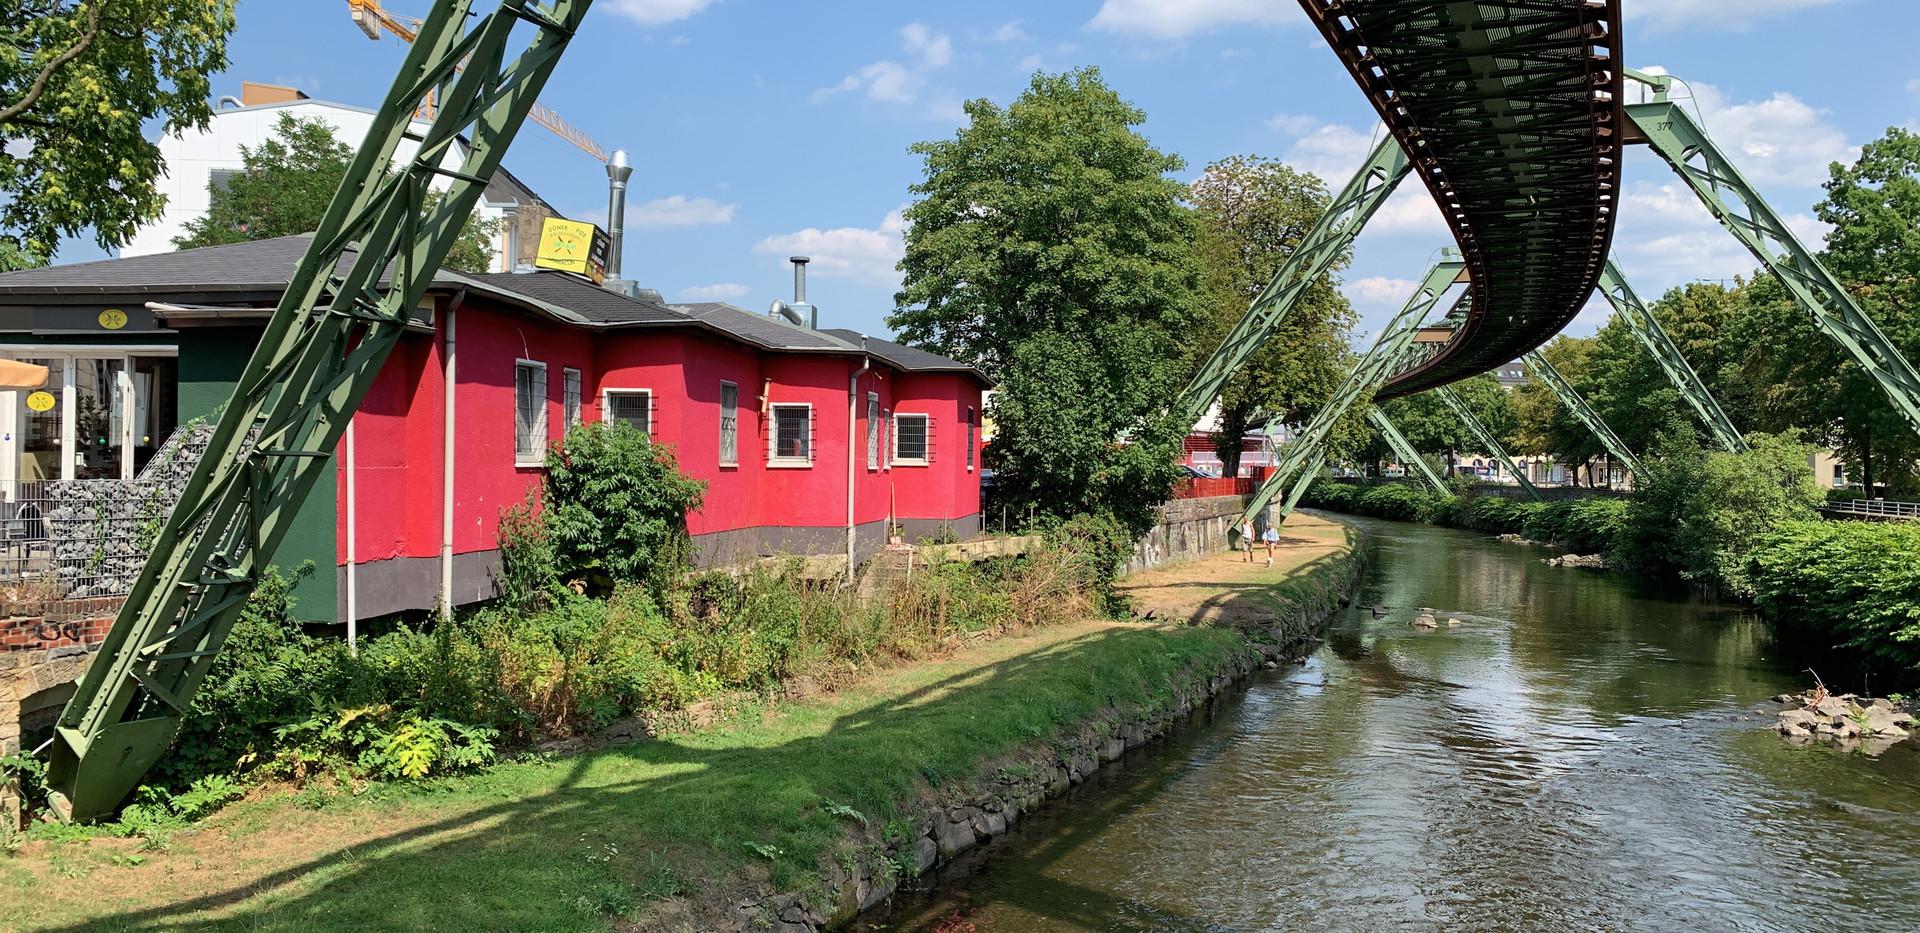 Unterdörnen 48 - 50, 42283 Wuppertal